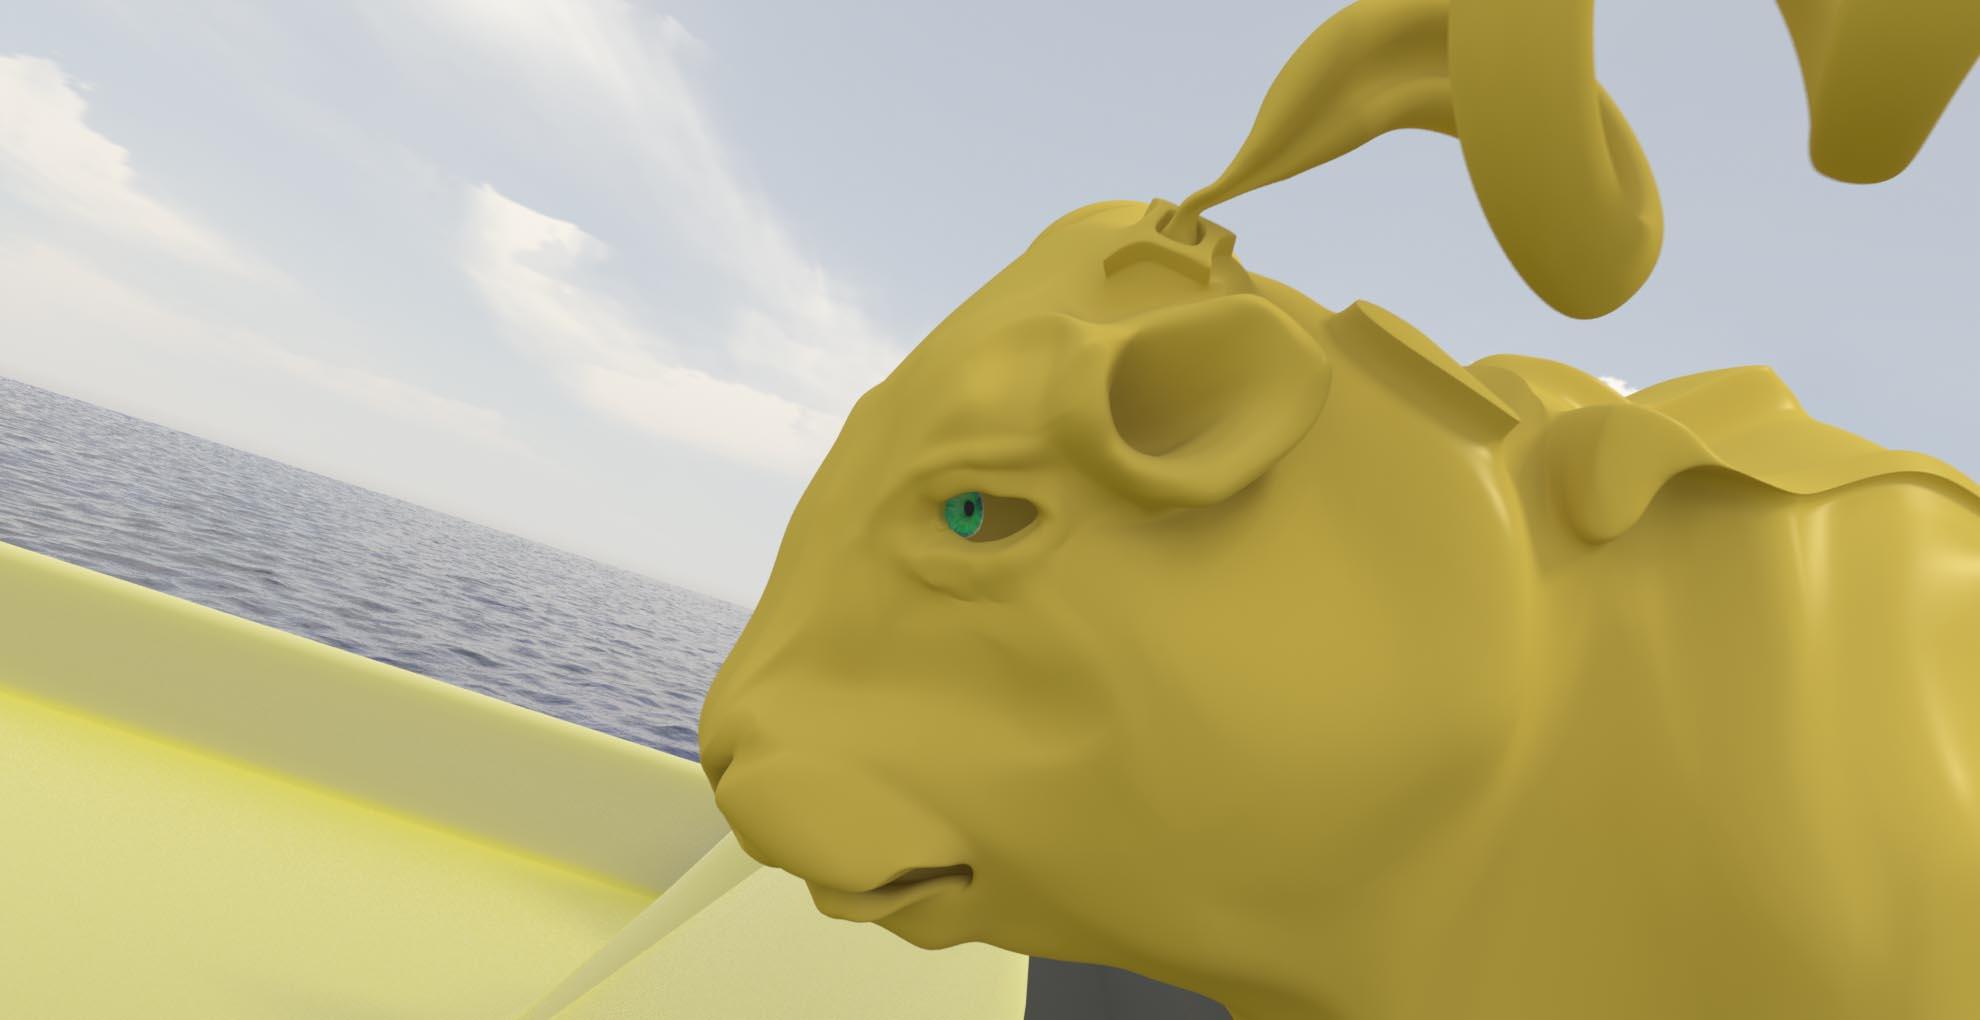 Cow_head_close_up_FC.jpg